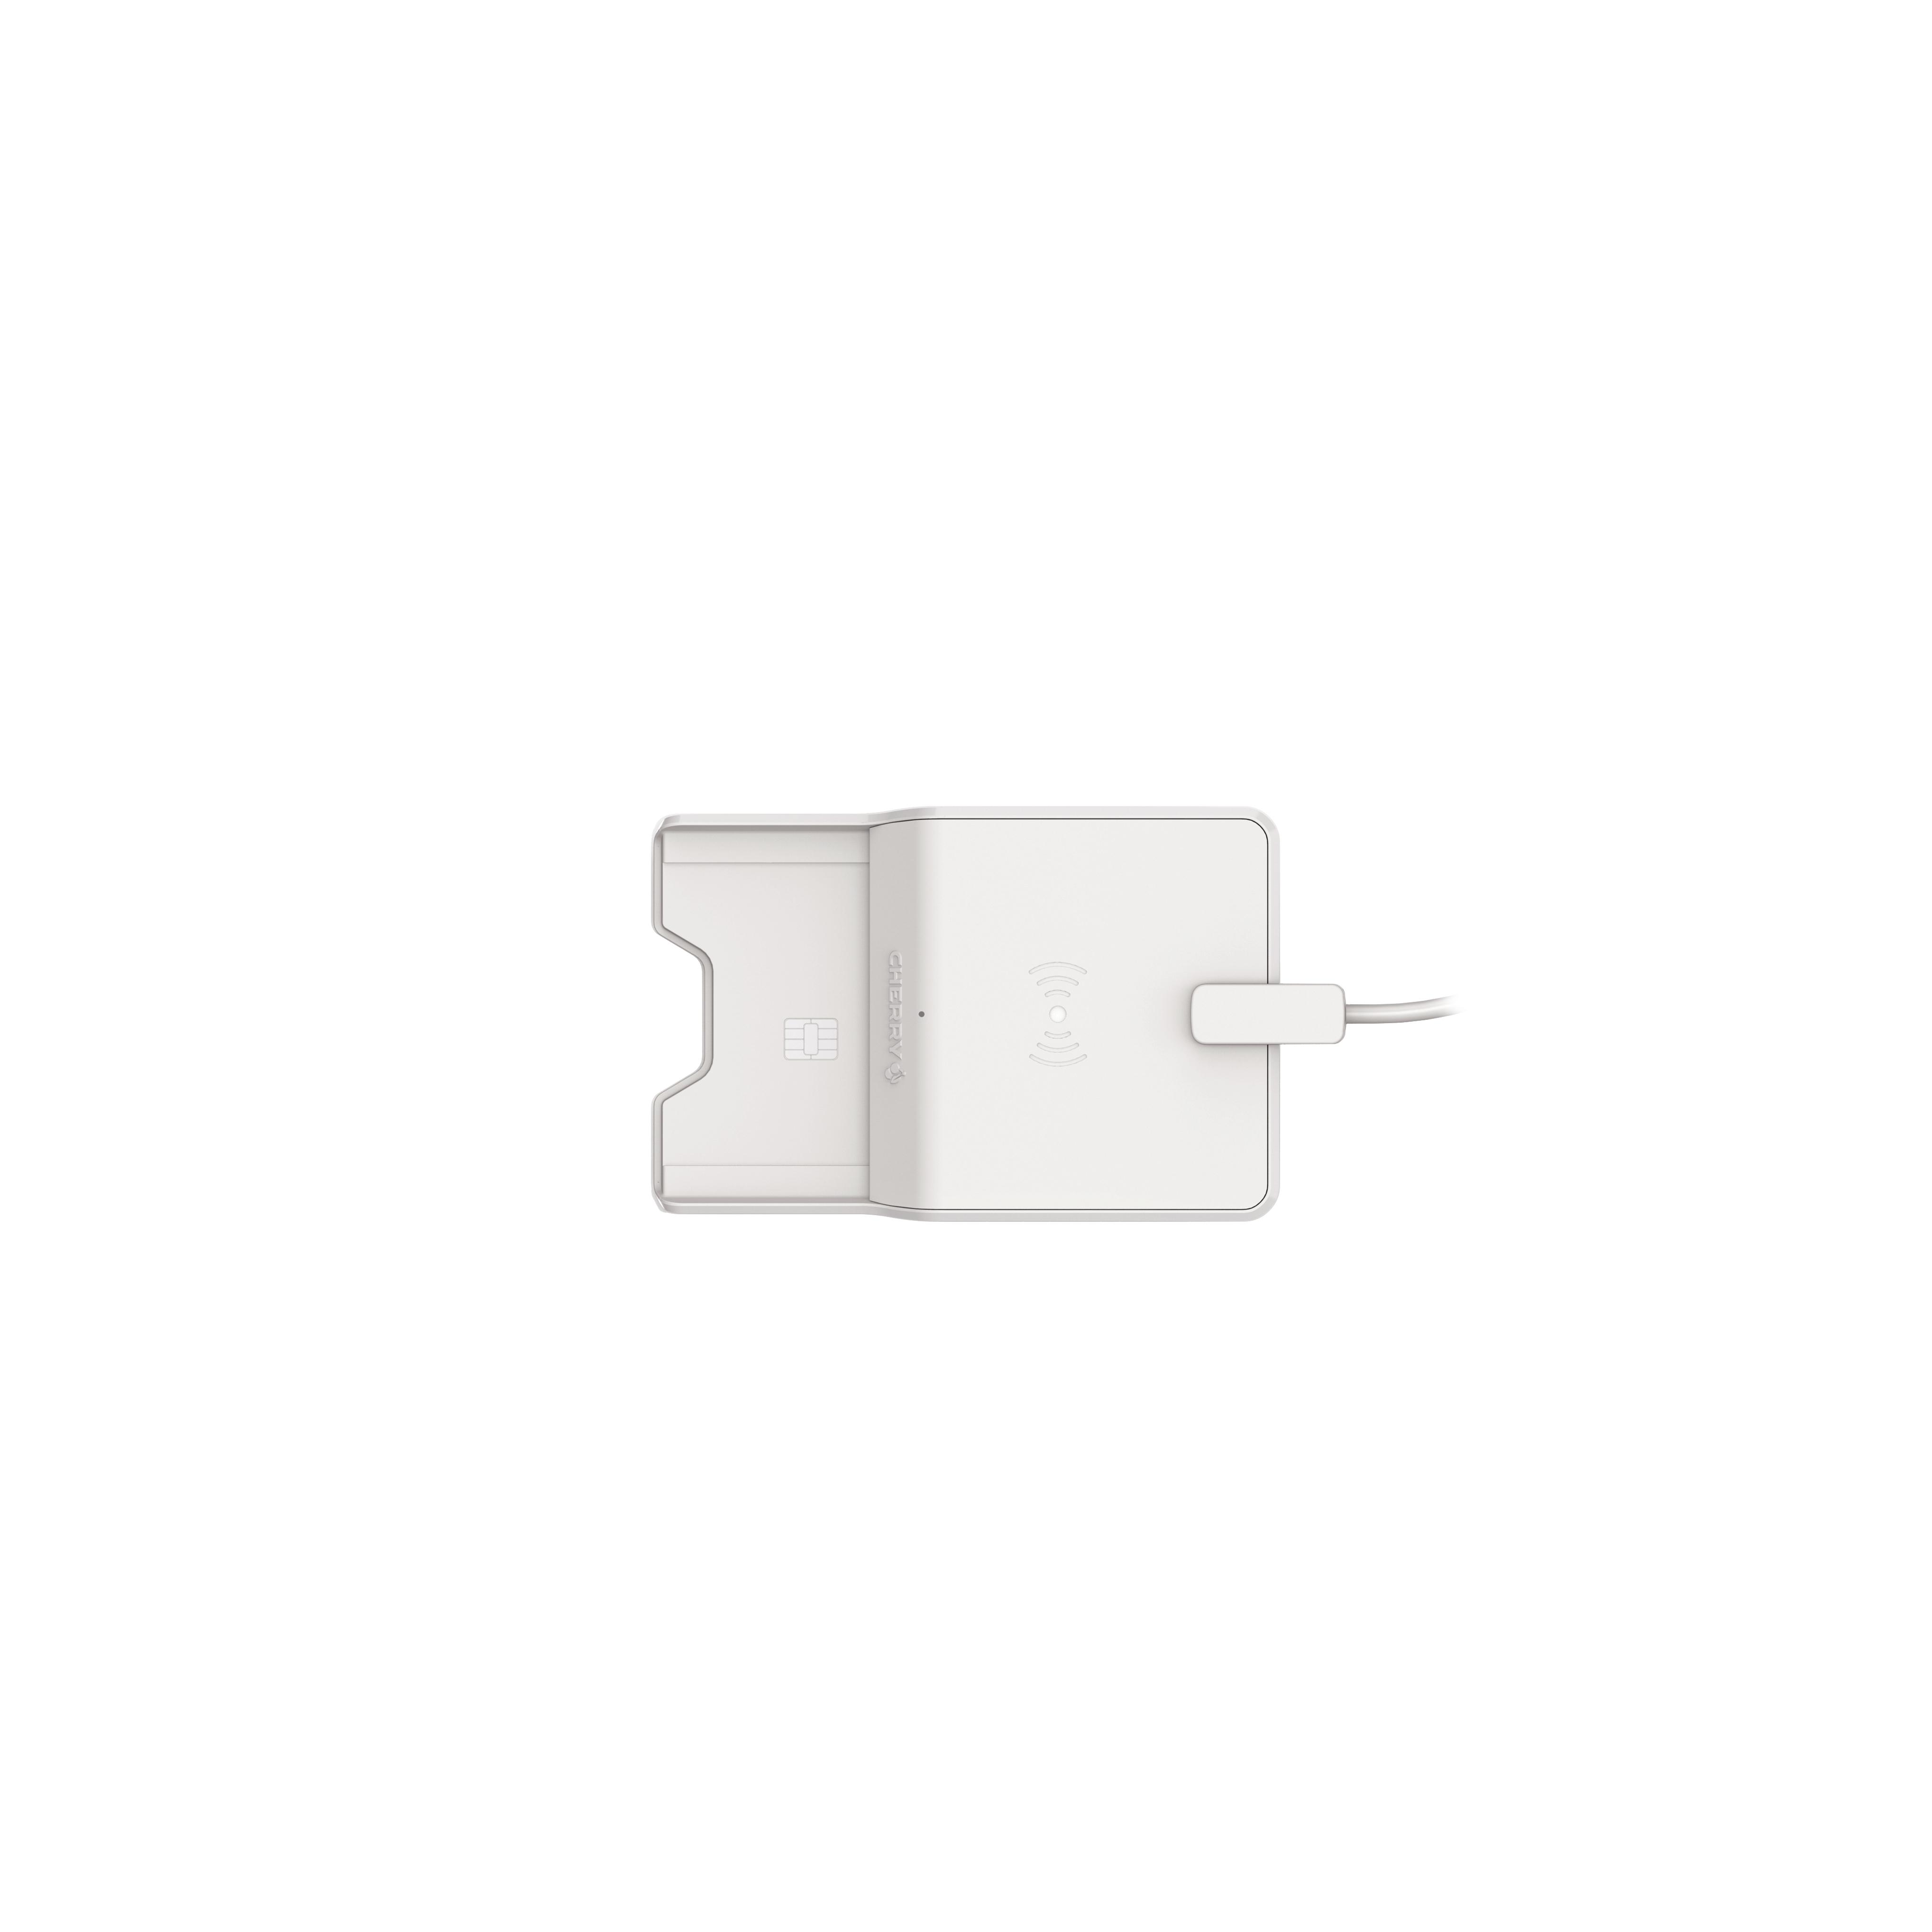 CHERRY SmartCardTerminal TC 1300 USB Klasse1 cardreader grey